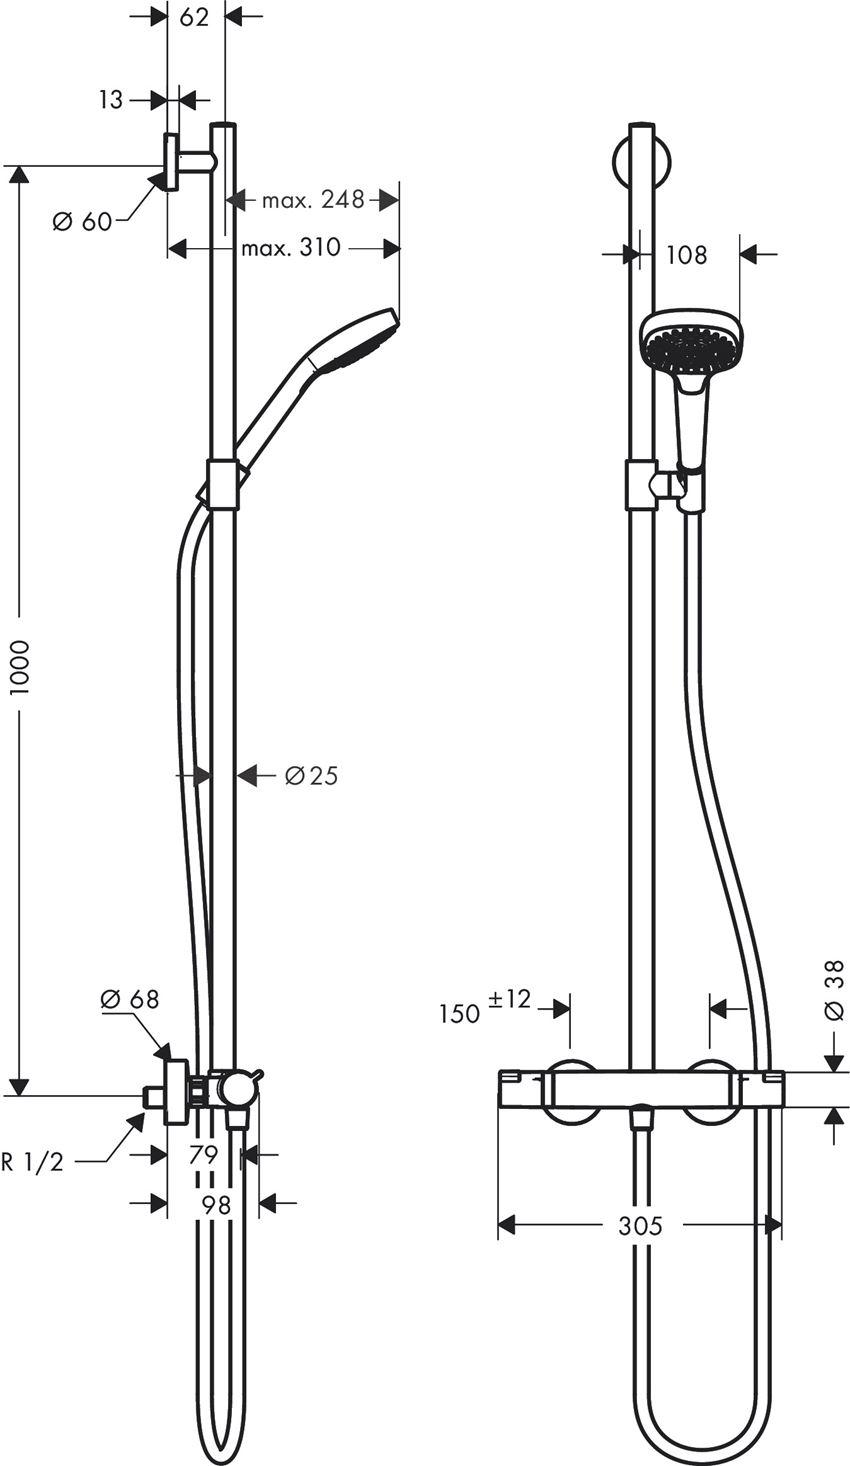 Komplet prysznicowy SemiPipe Multi z termostatem Hansgrohe Croma Select E  rysunek techniczny